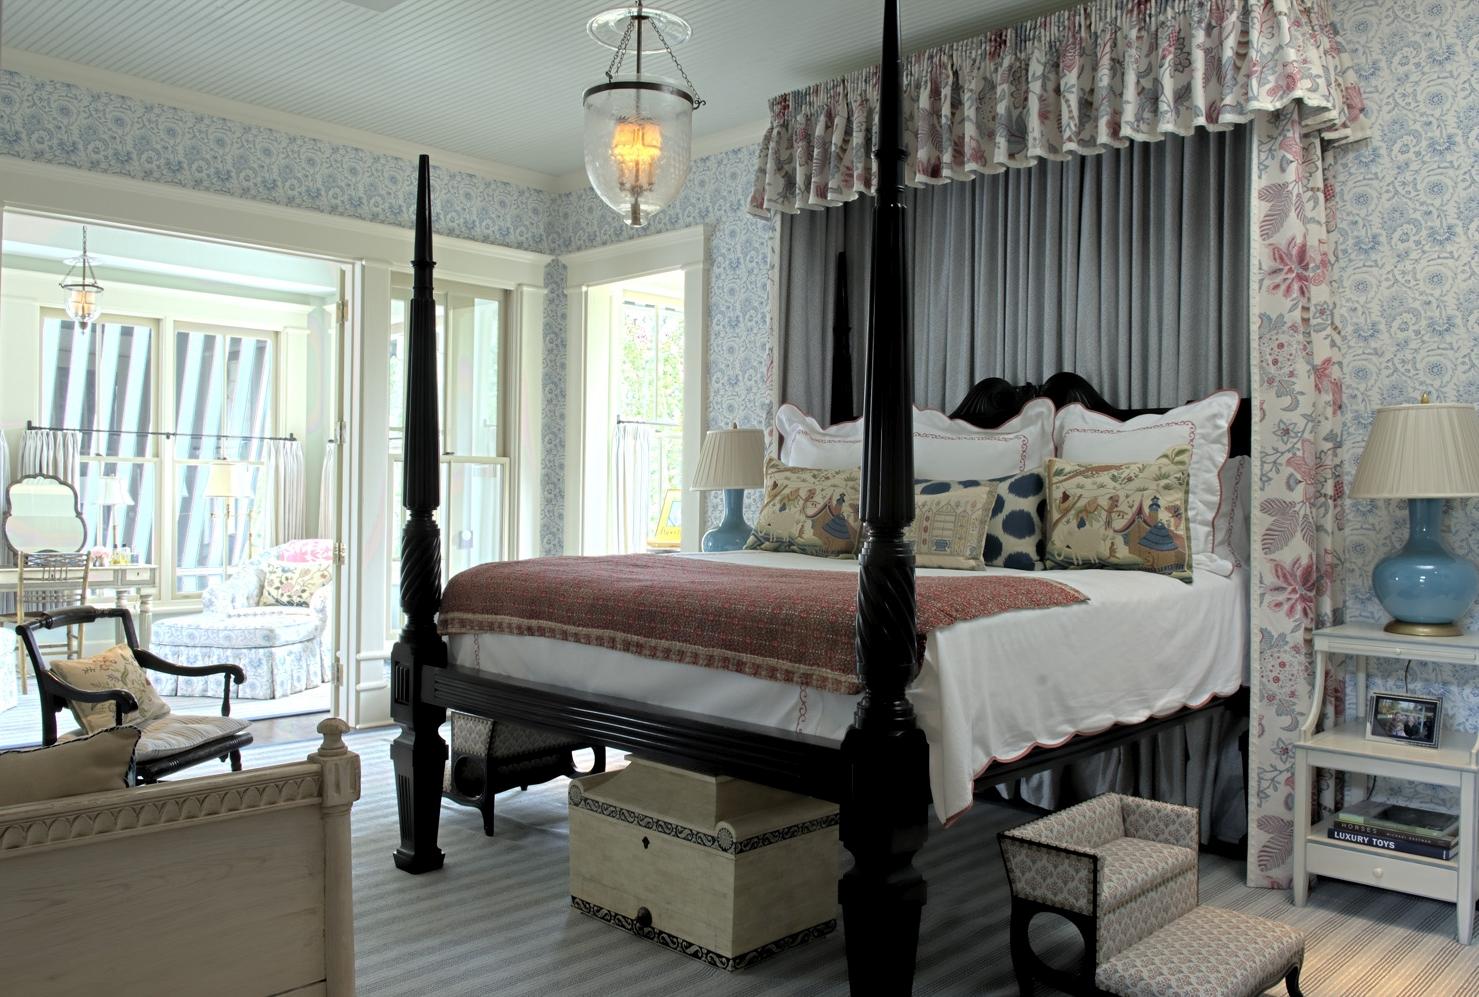 Injigo Lace - Blue (walling), Banyan - Blue Pink (bed drapes)